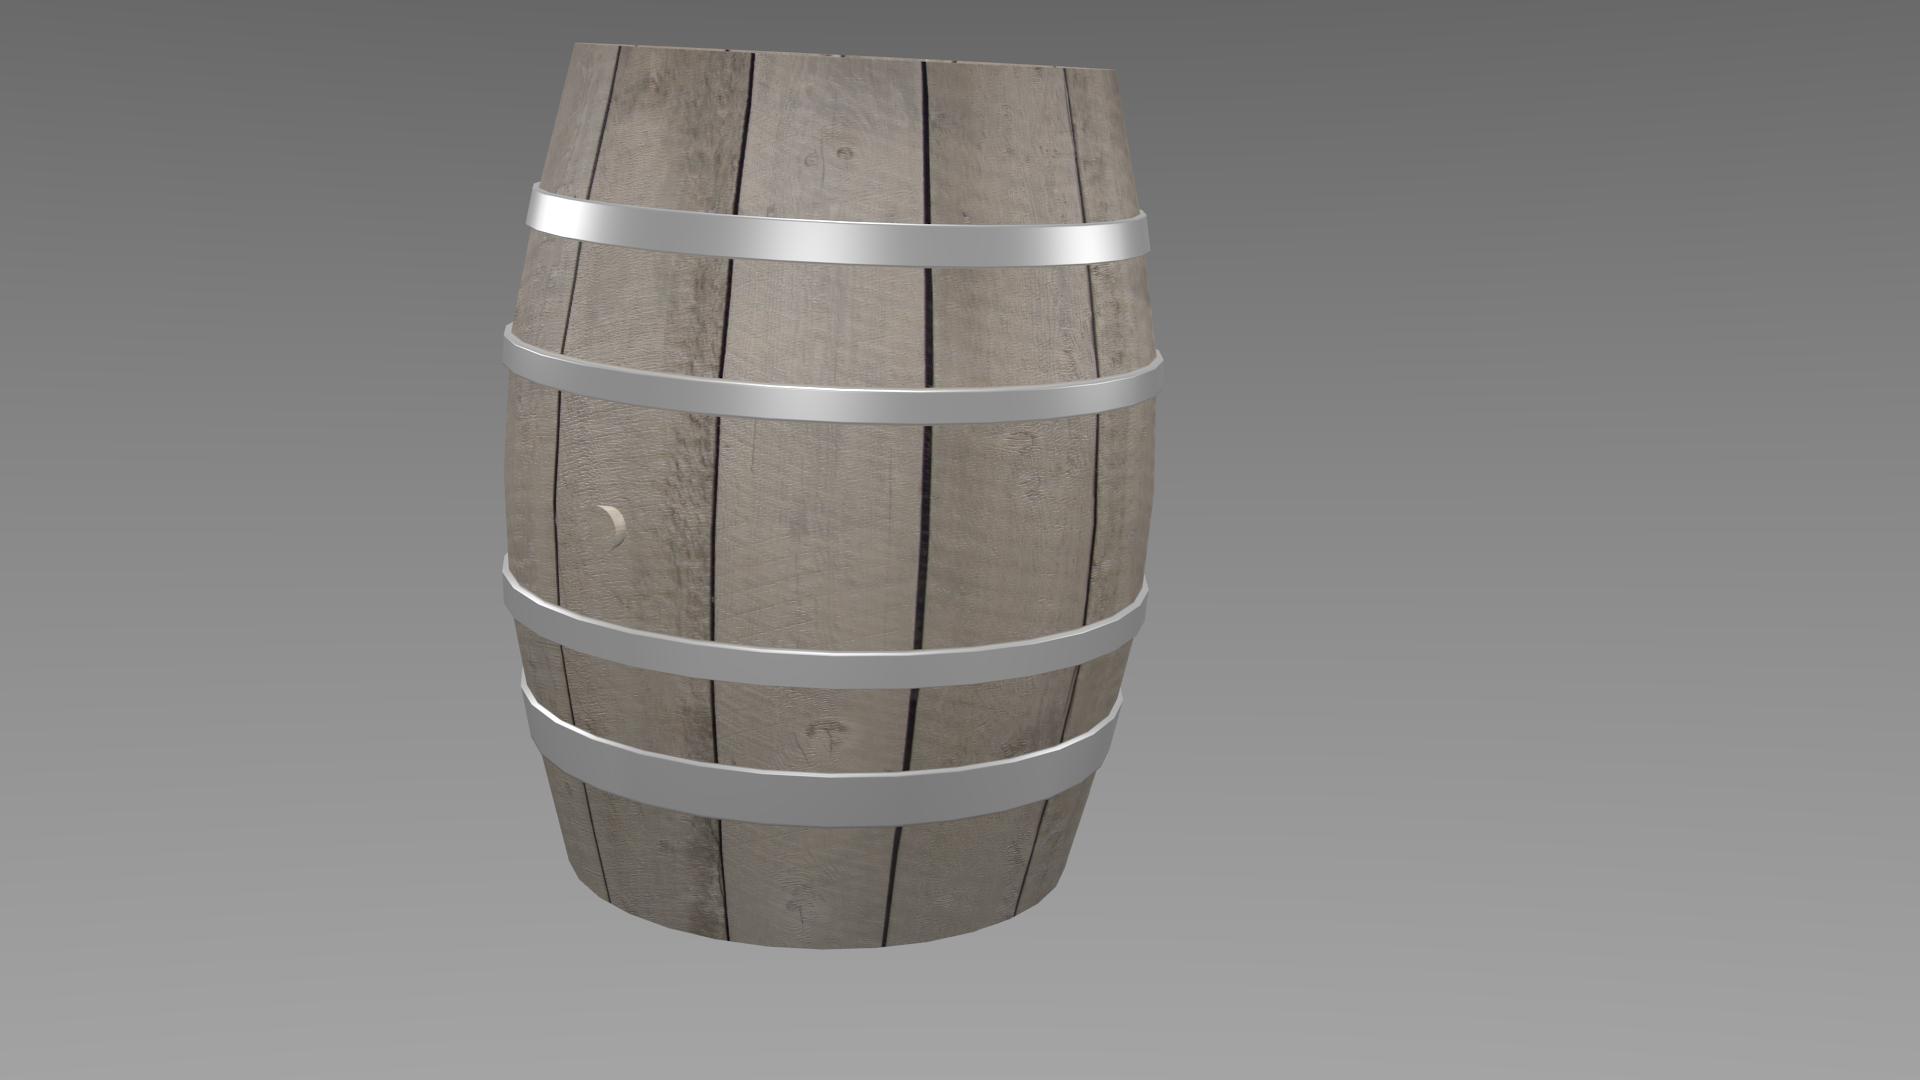 Wood Barrel Barrel Wood Layout Design Inspiration